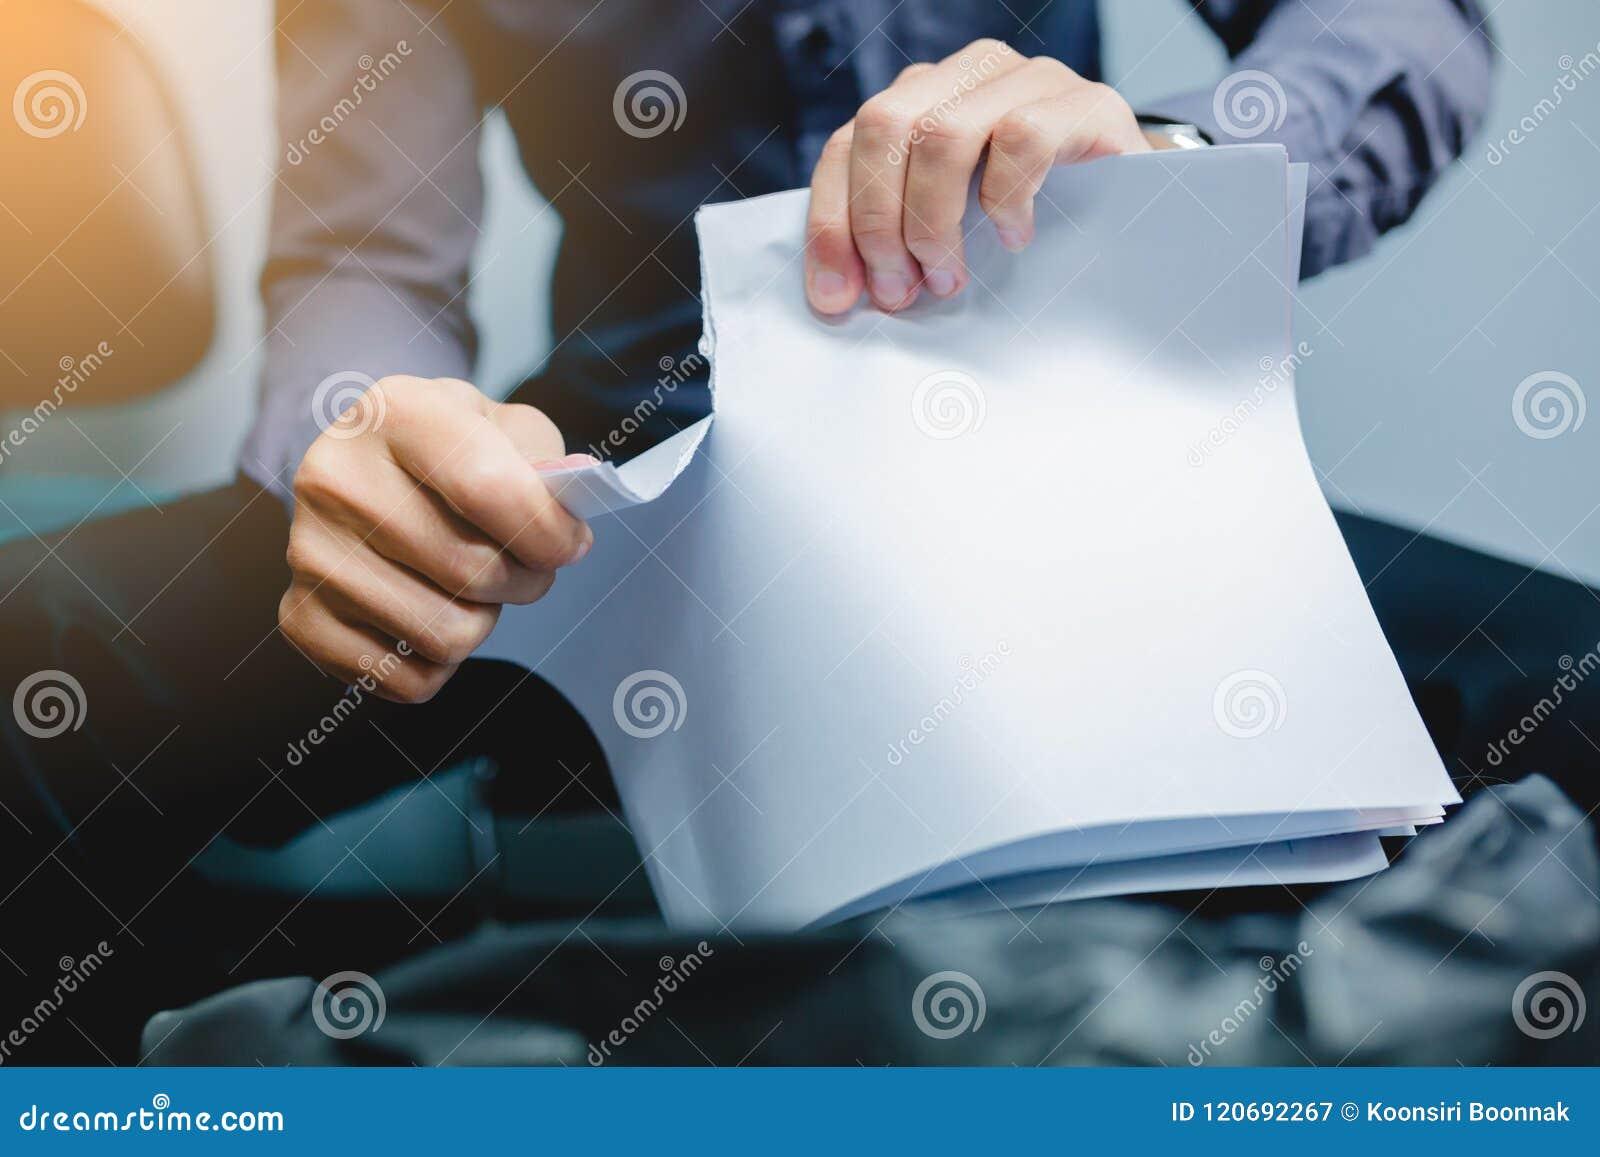 Businessman tearing blank paper apart